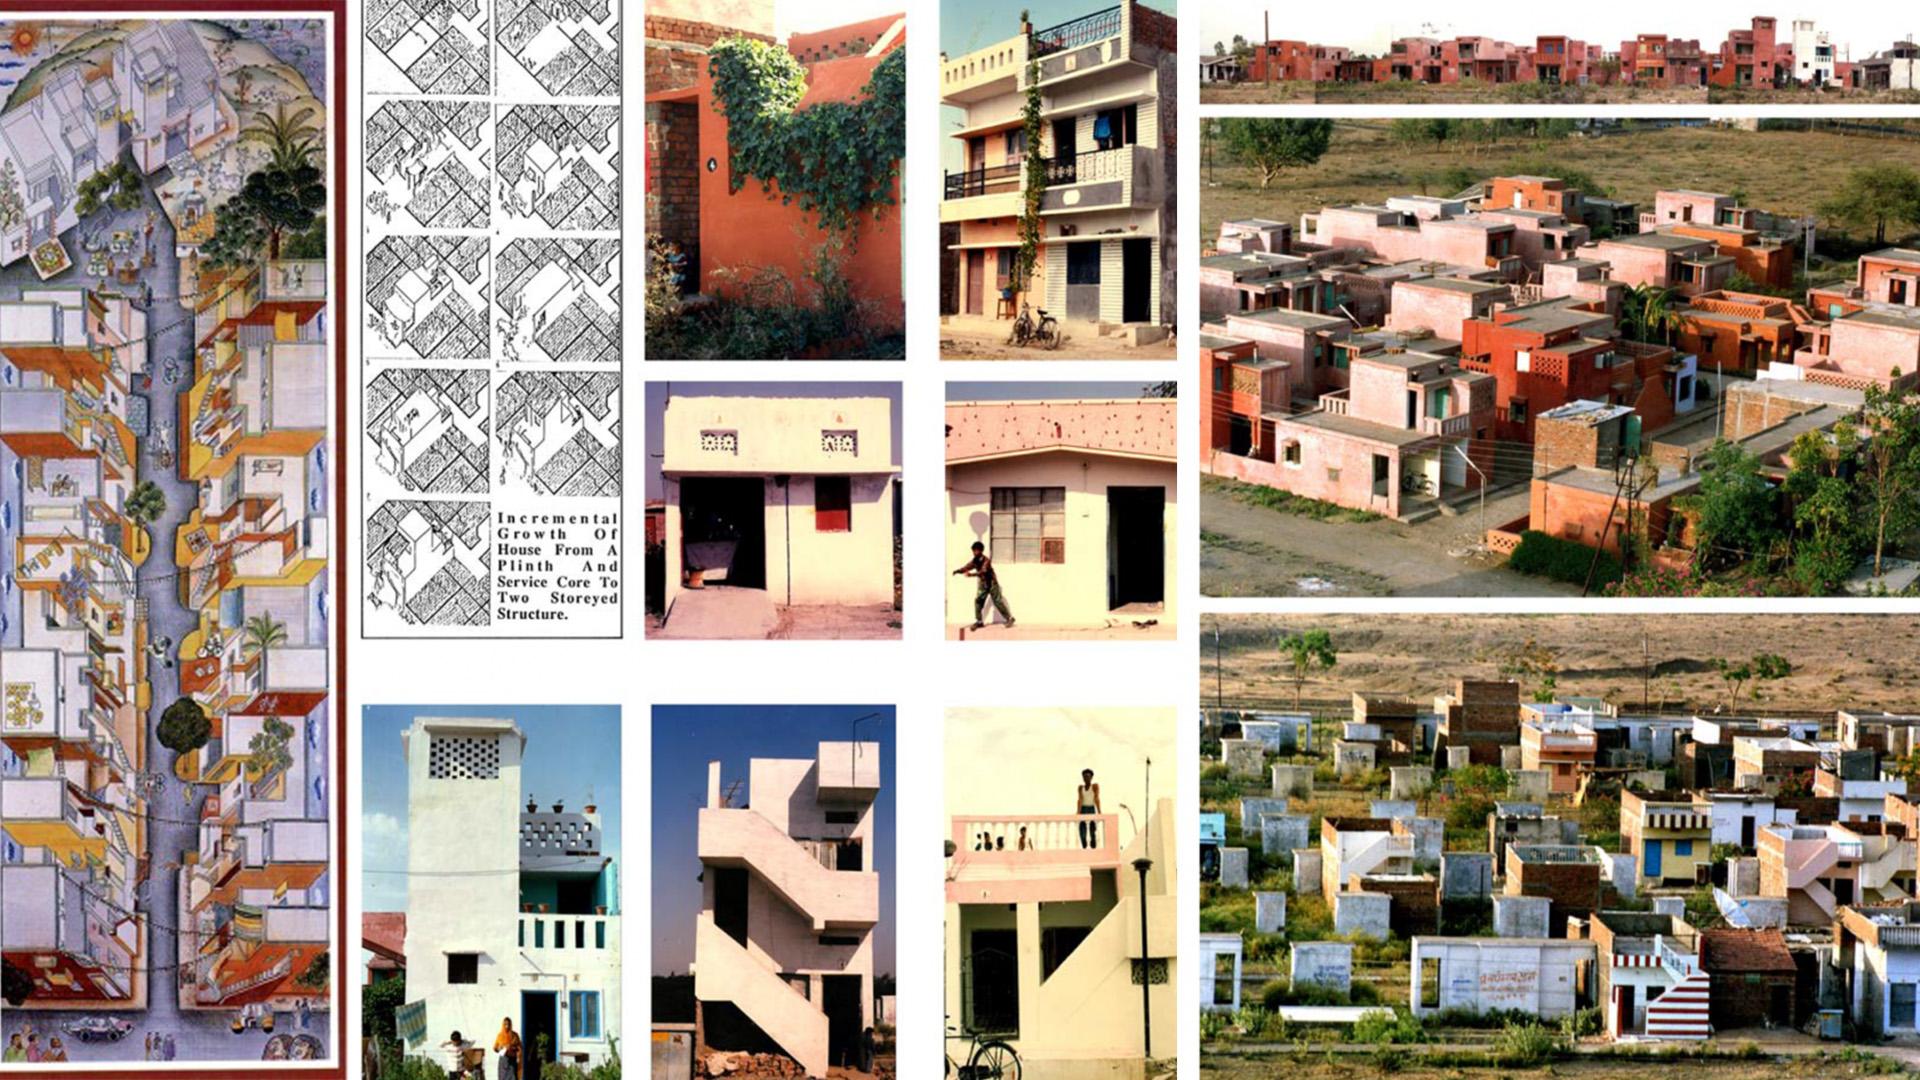 Aaranya Low-cost Housing by BV Doshi